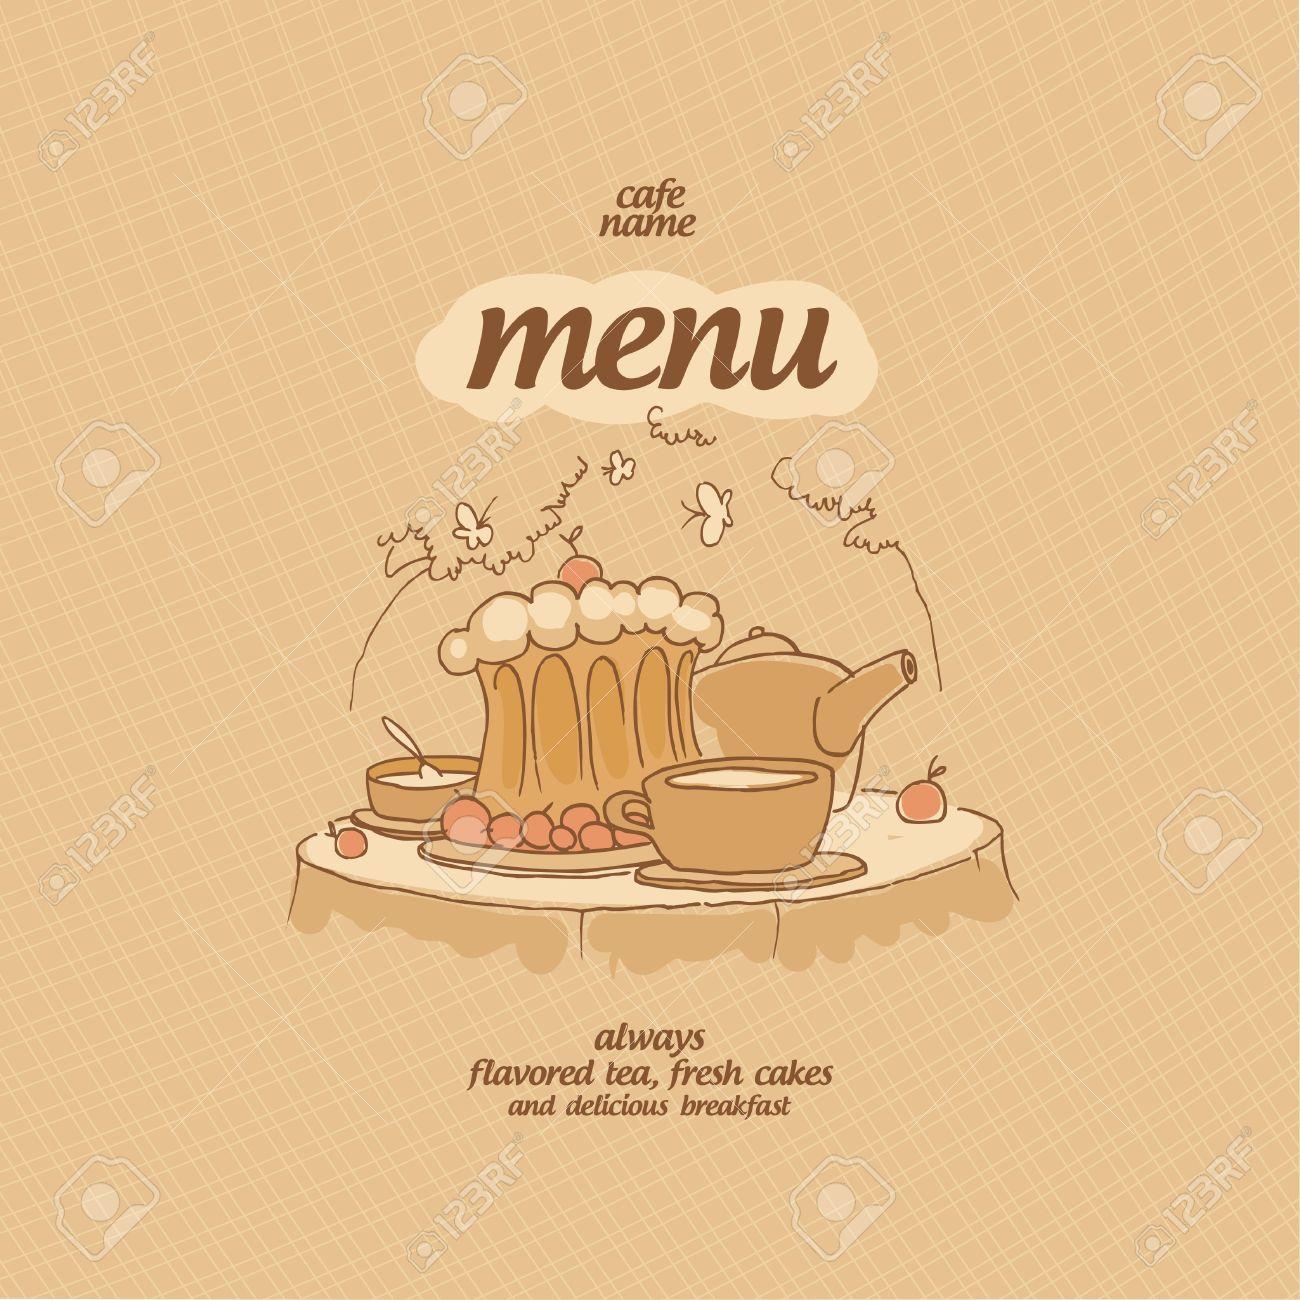 Cafe Menu Card Design template Stock Vector - 14445605